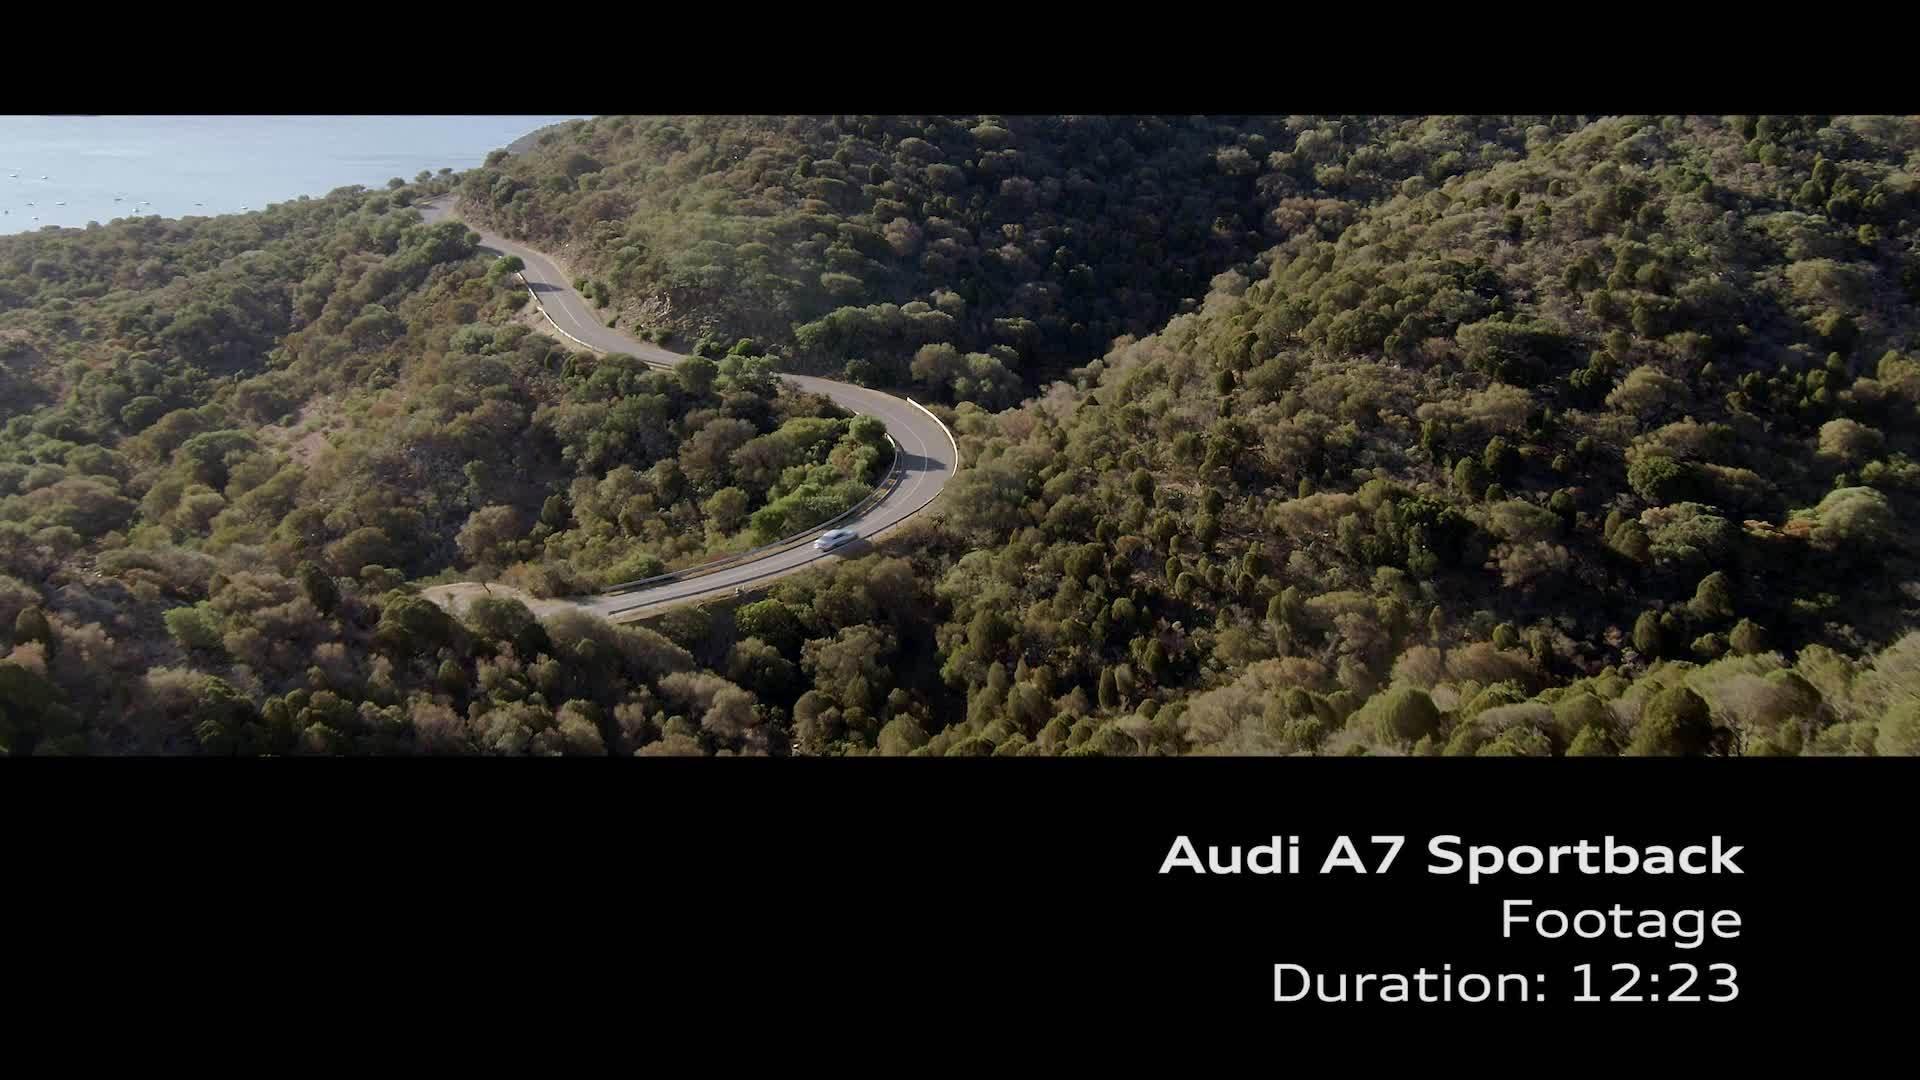 Audi A7 Sportback Footage grey